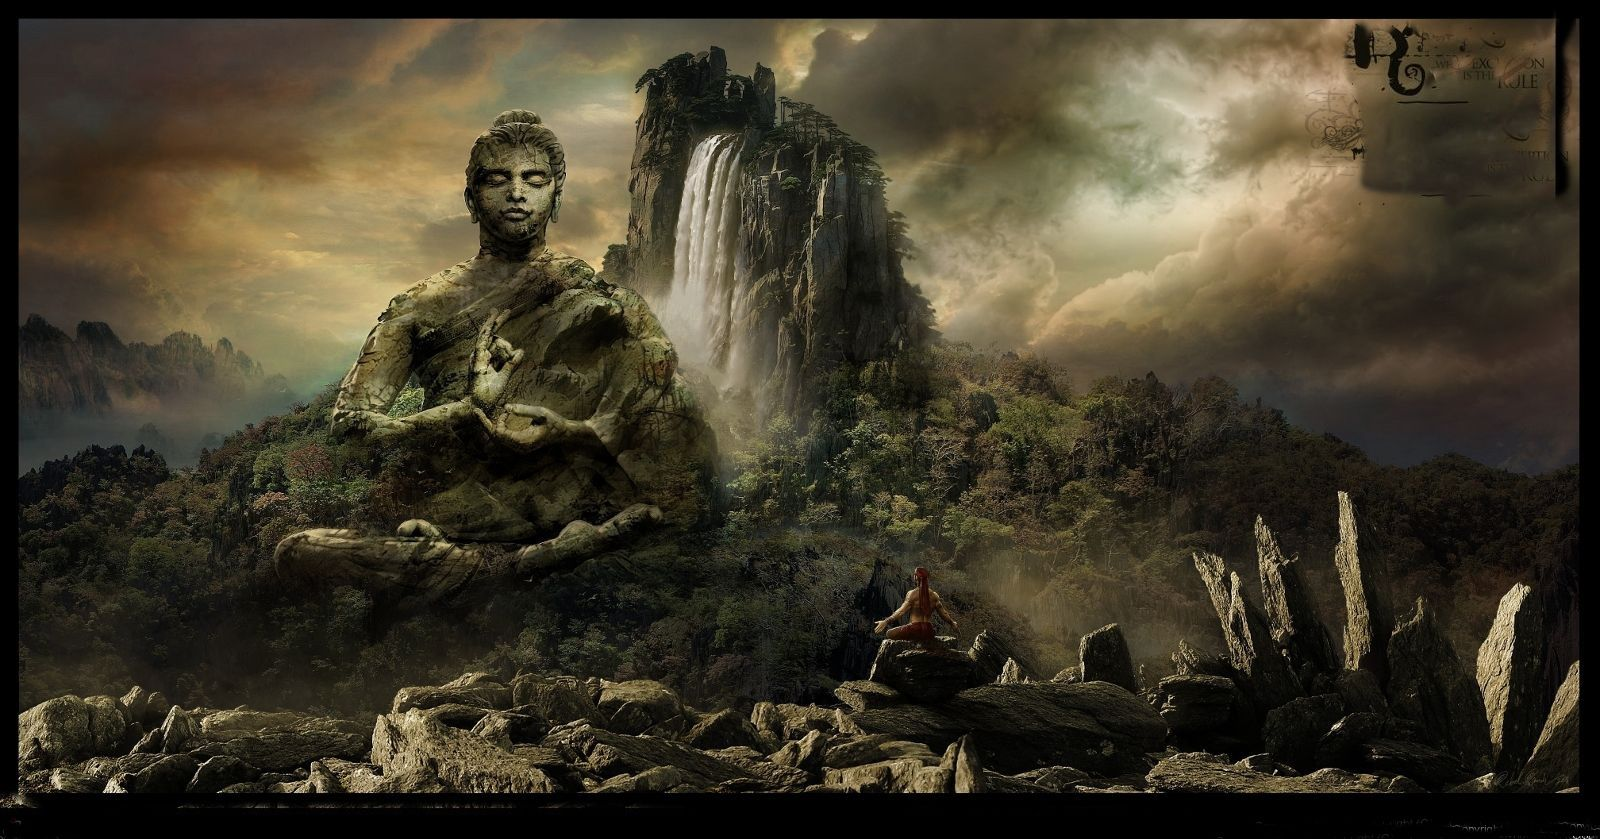 Buddha Darshan Hd Wallpaper Jpg 1 600 839 Pixels Buddha Buddhism Buddha Art